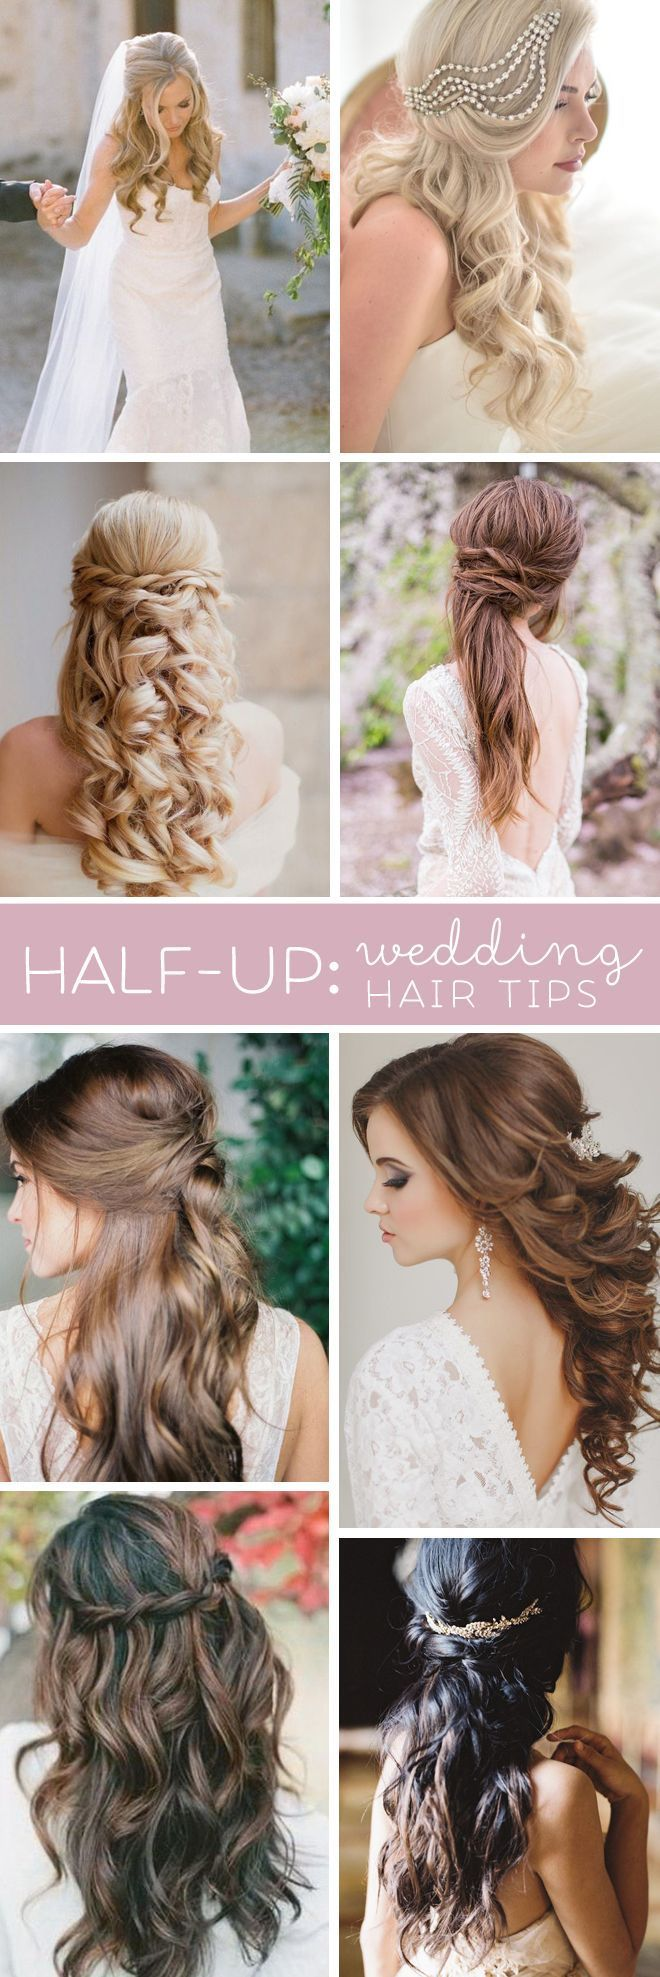 Wedding hair tips halfup halfdown styles wedding vision and